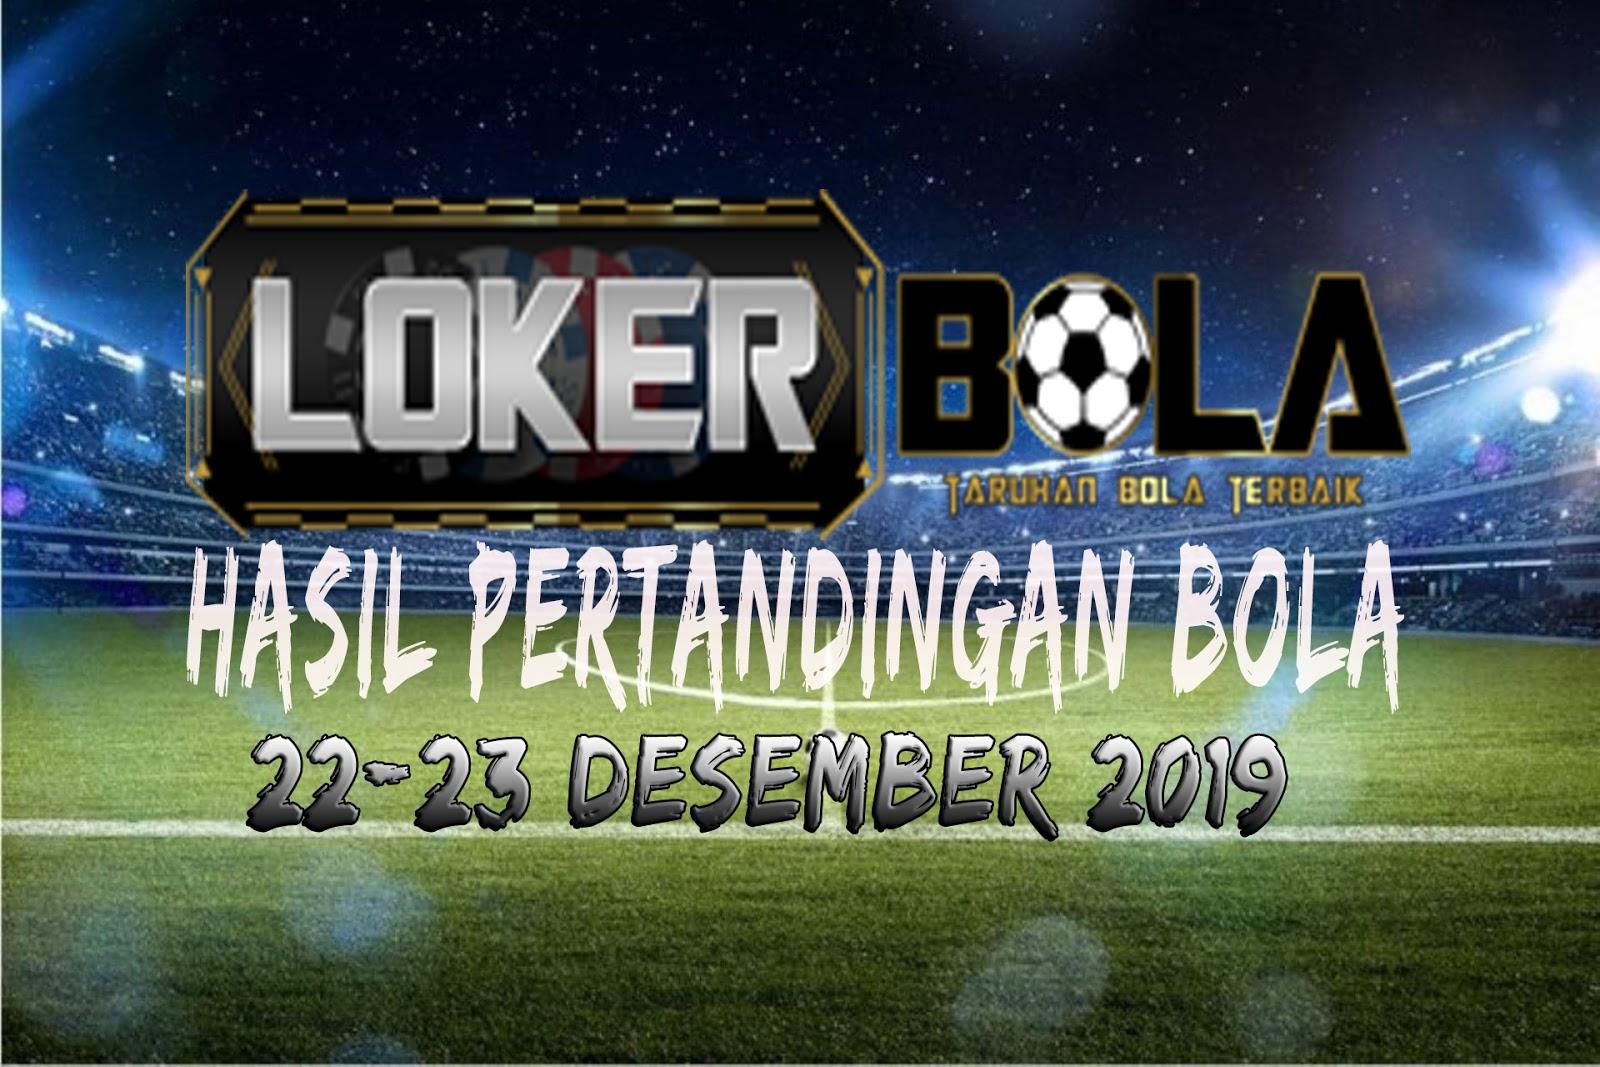 HASIL PERTANDINGAN BOLA 22 – 23 DESEMBER 2019